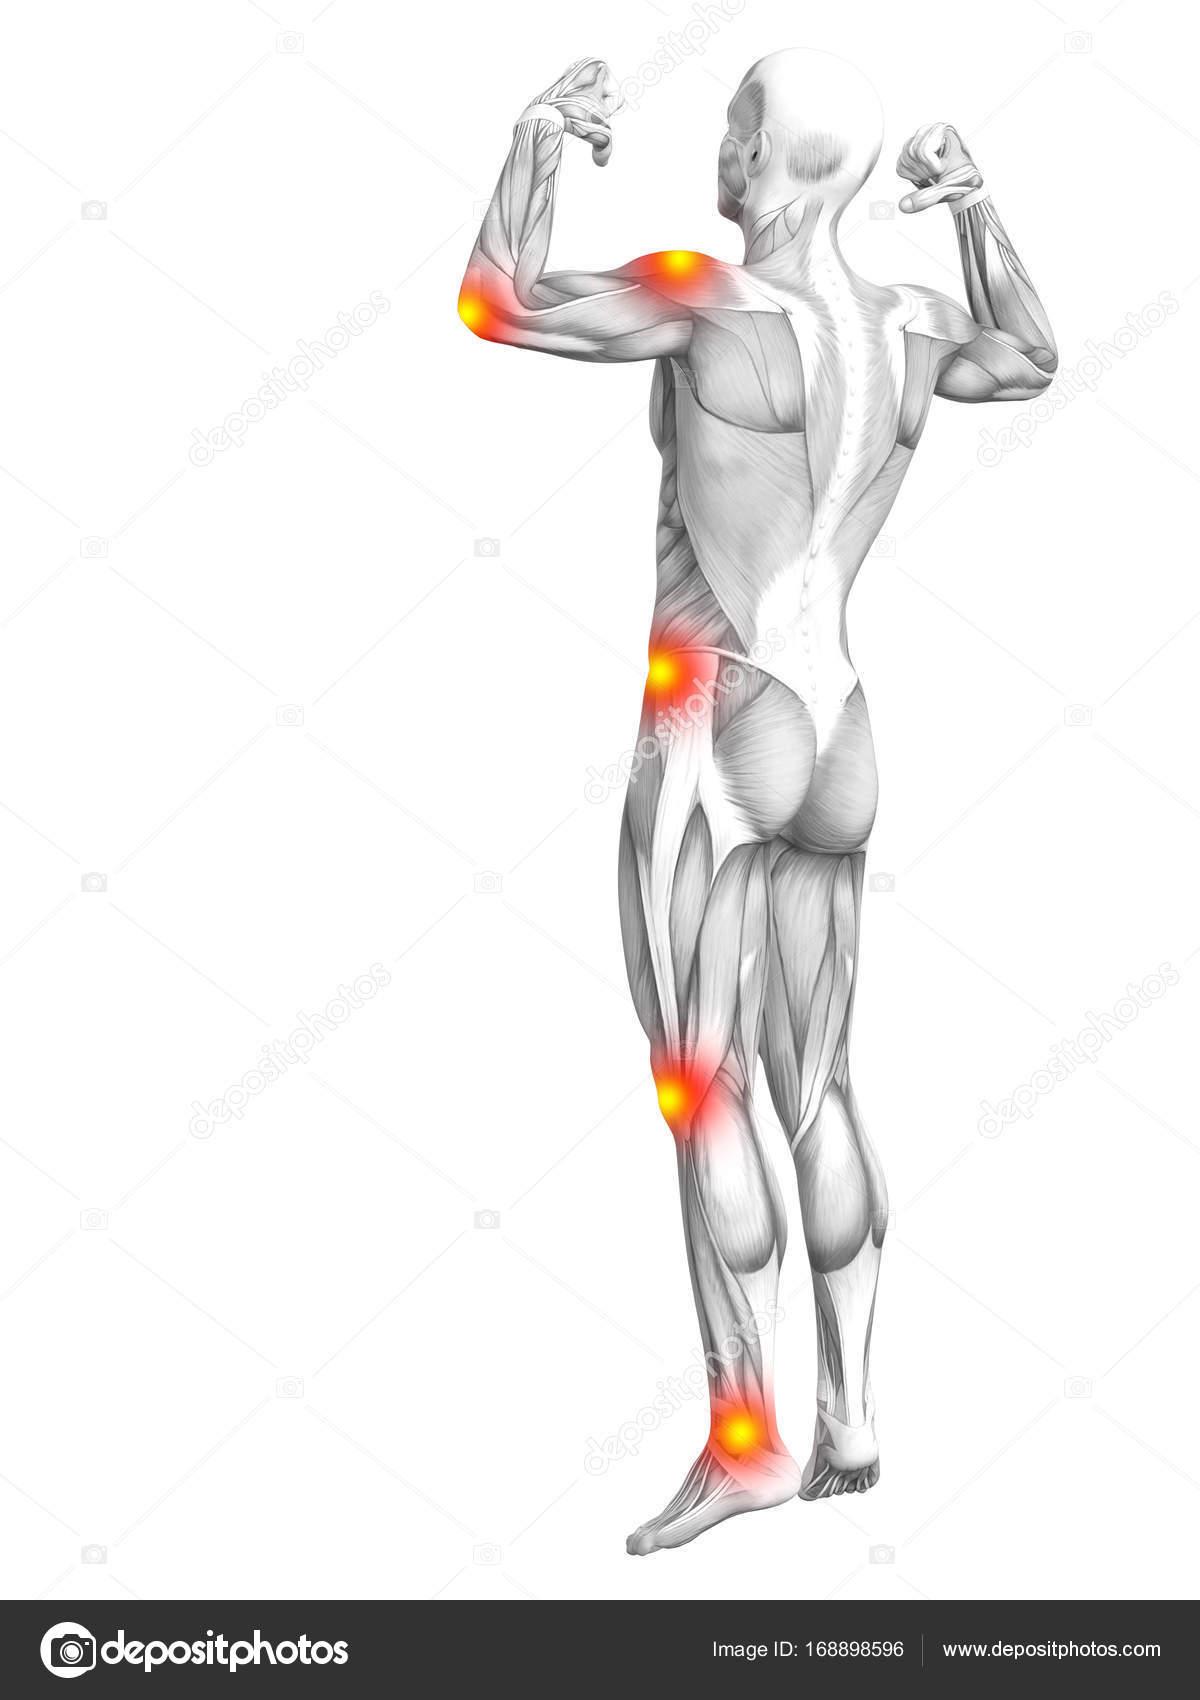 Muman Muskel Anatomie mit roten Flecken — Stockfoto © design36 ...